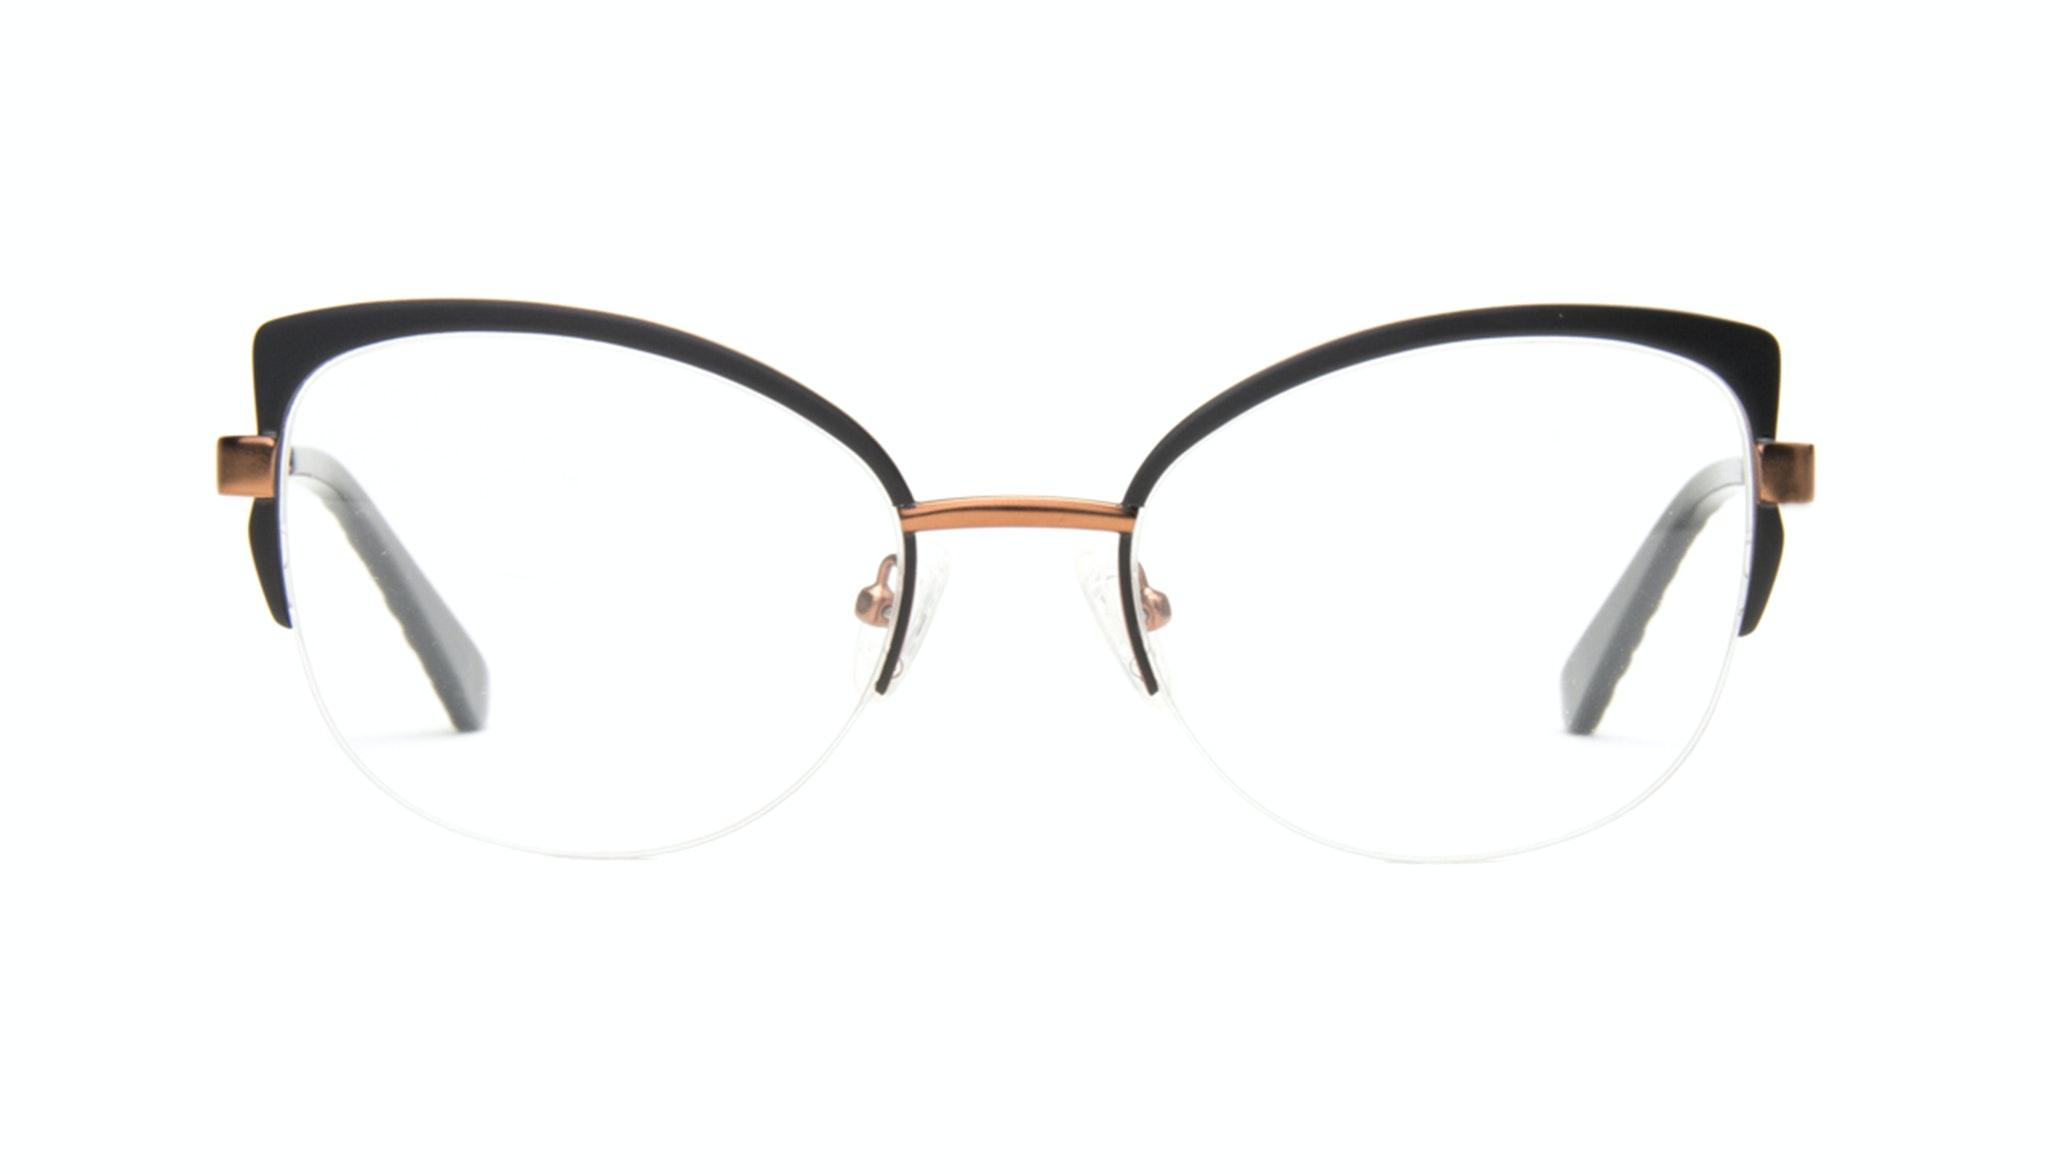 Affordable Fashion Glasses Cat Eye Semi-Rimless Eyeglasses Women Adore Black Copper Front